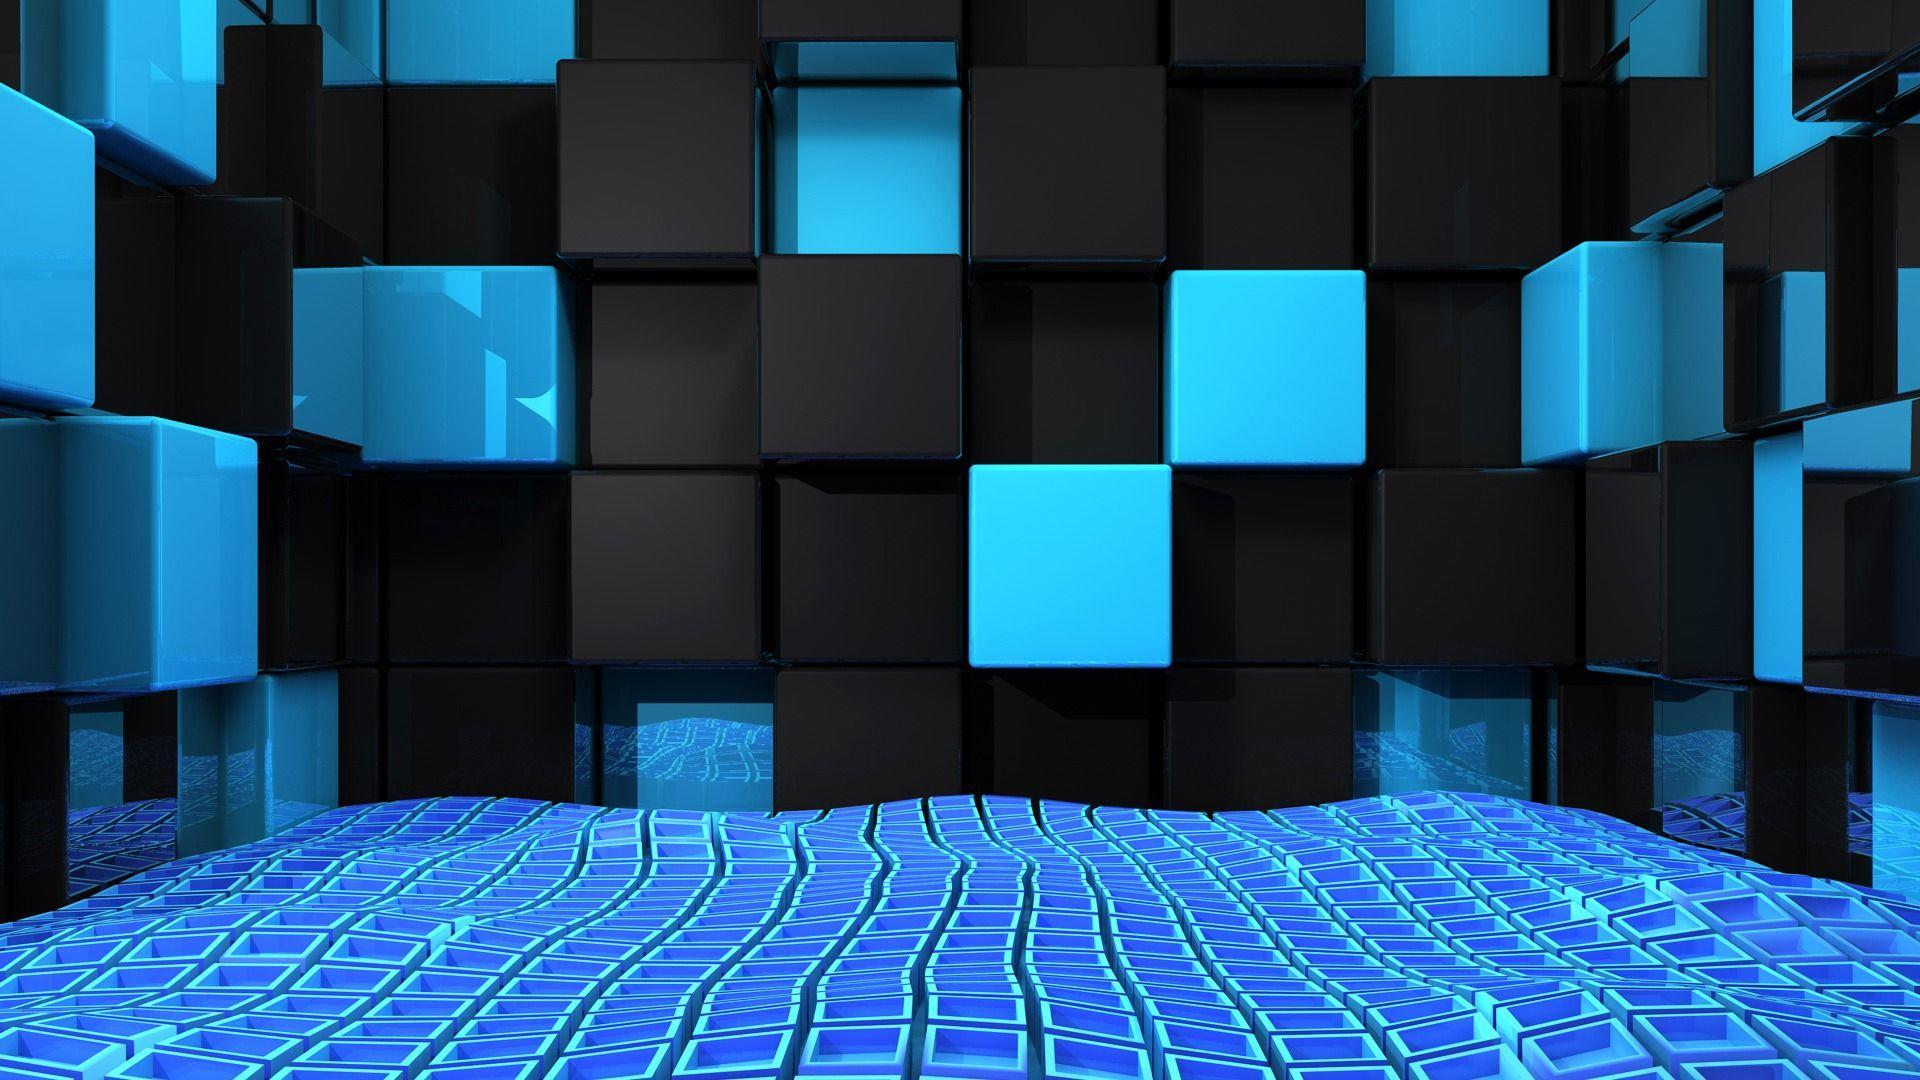 Full Hd Wallpapers 1080p Desktop 3d Wallpaper Cave